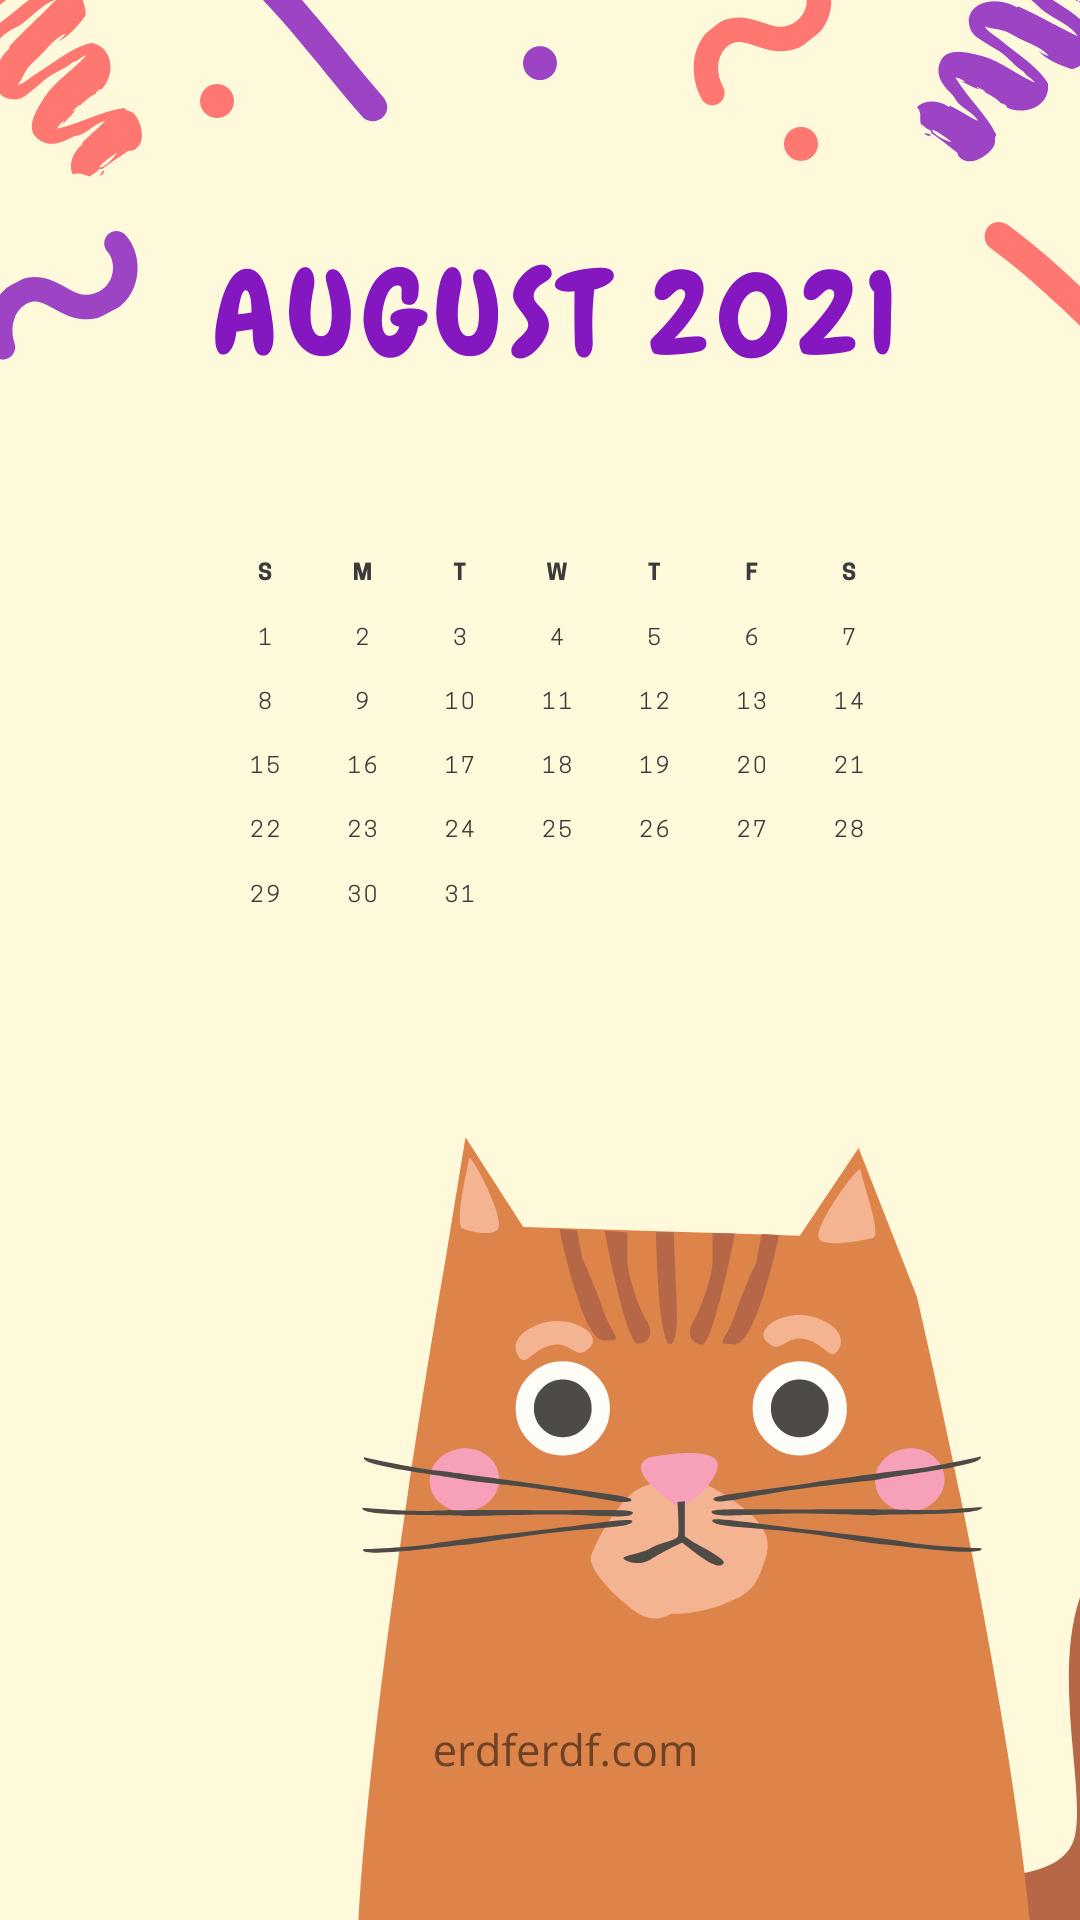 August 2021 Callendar Wallpaper Iphone Cat Cute Brown Cat